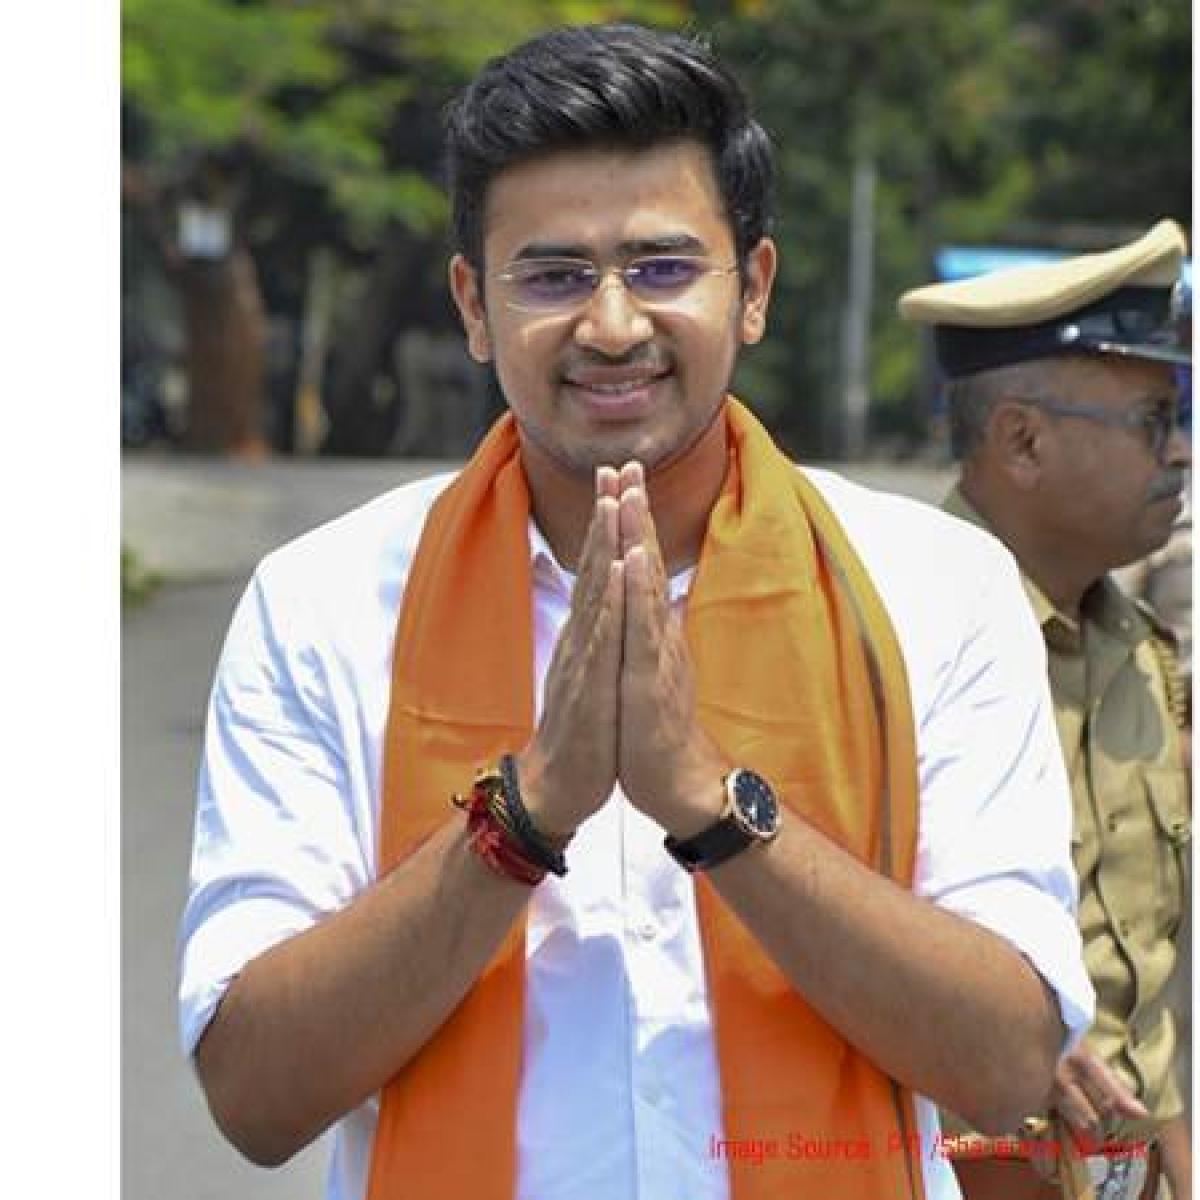 After Hyderabad, BJP to deploy Yogi Adityanath, Tejasvi Yadav in Tamil Nadu ahead of Assembly polls